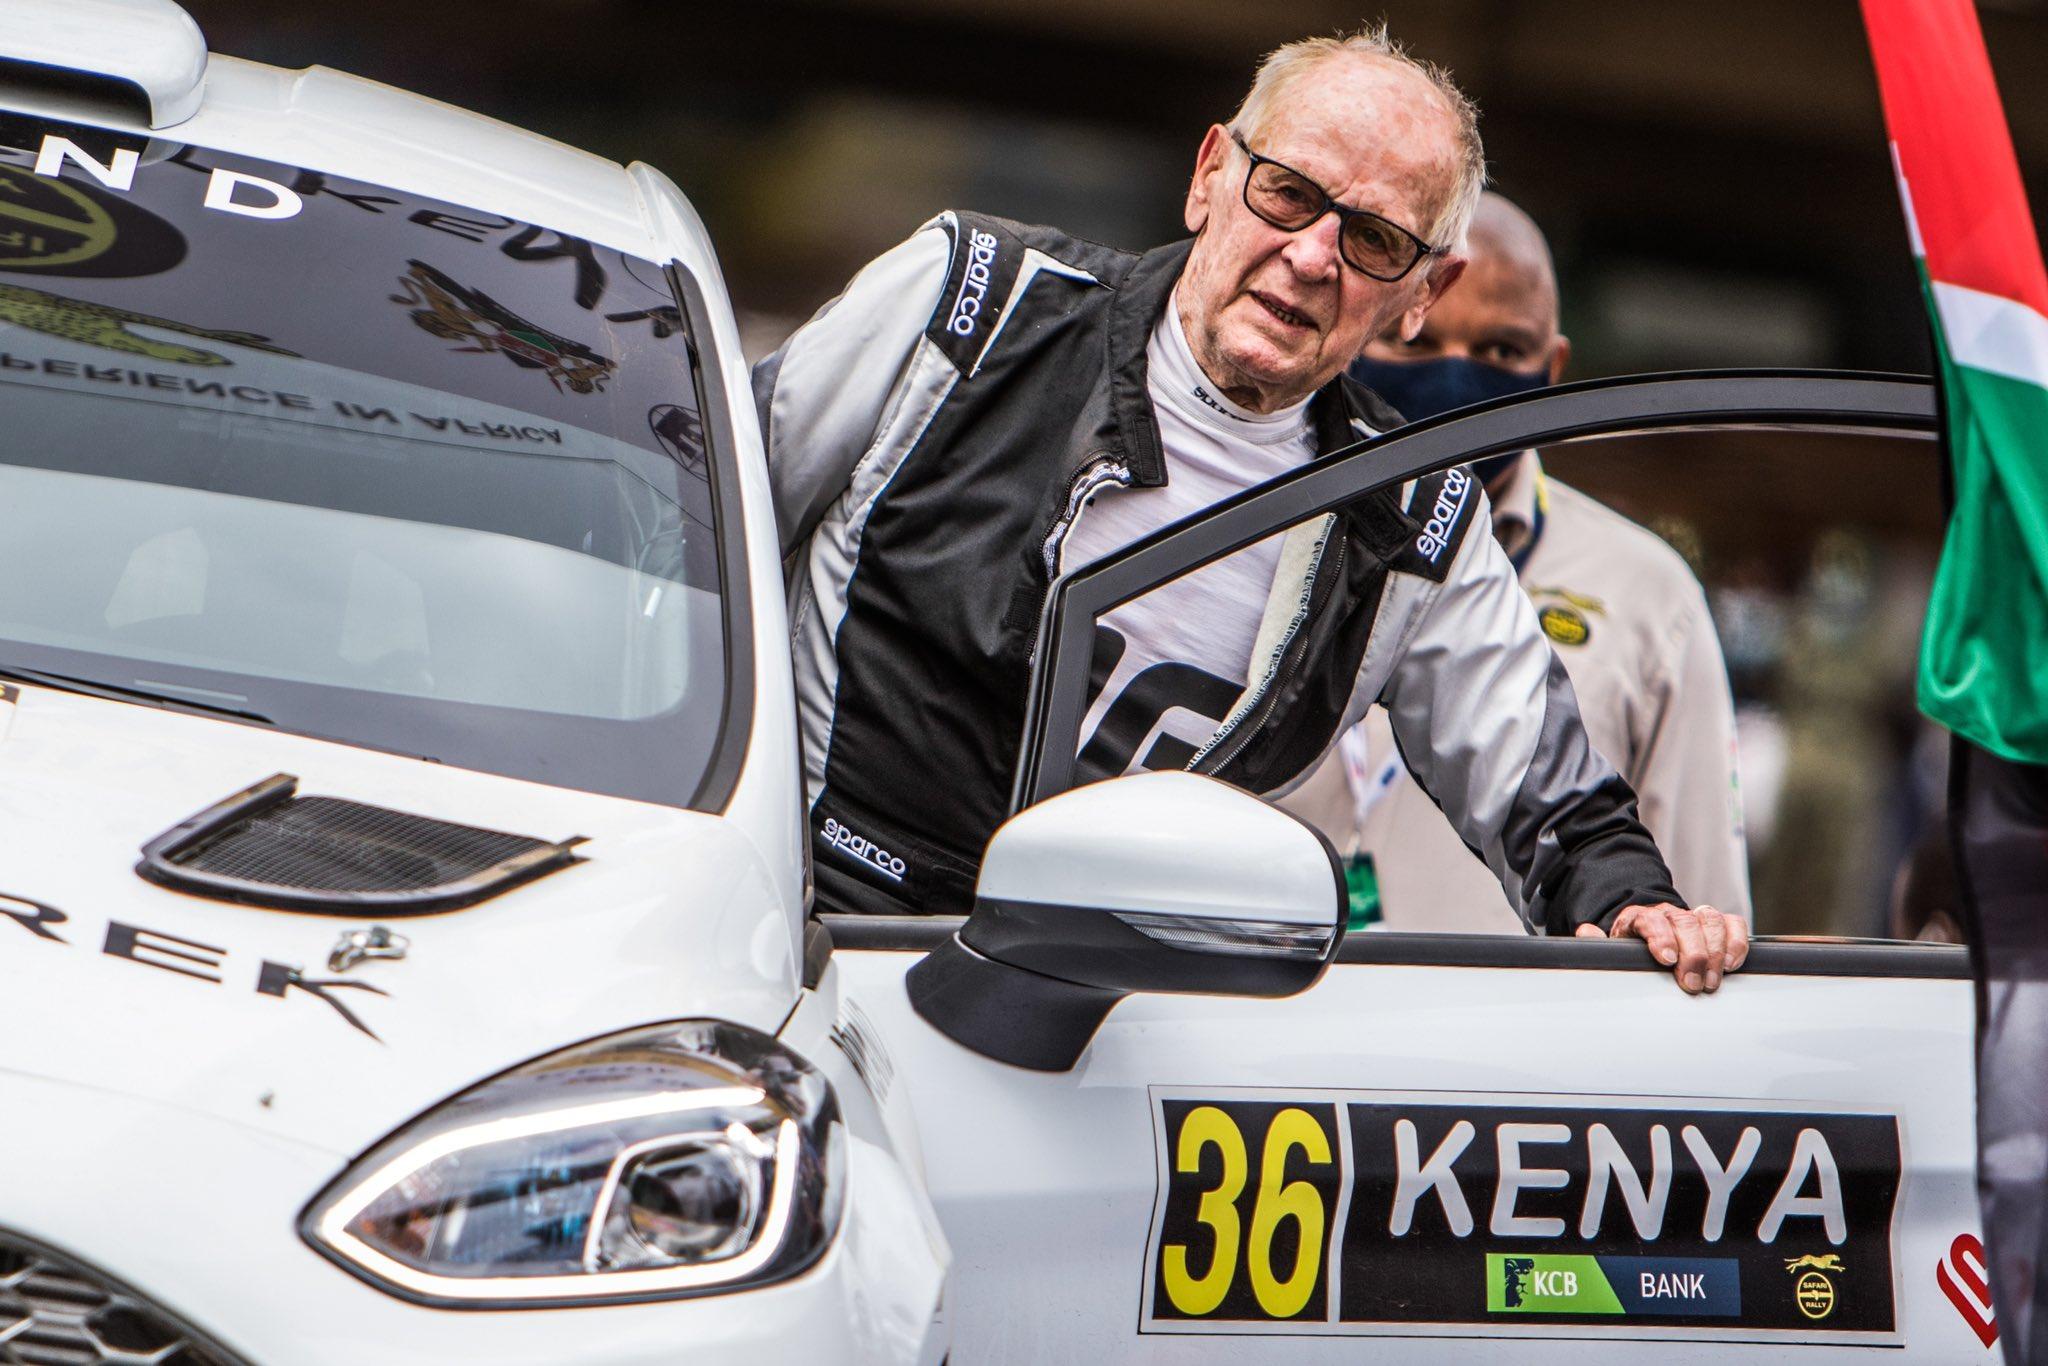 WRC: Safari Rally Kenya [23-27 Junio] - Página 6 E45eVv1XMAcELdO?format=jpg&name=large